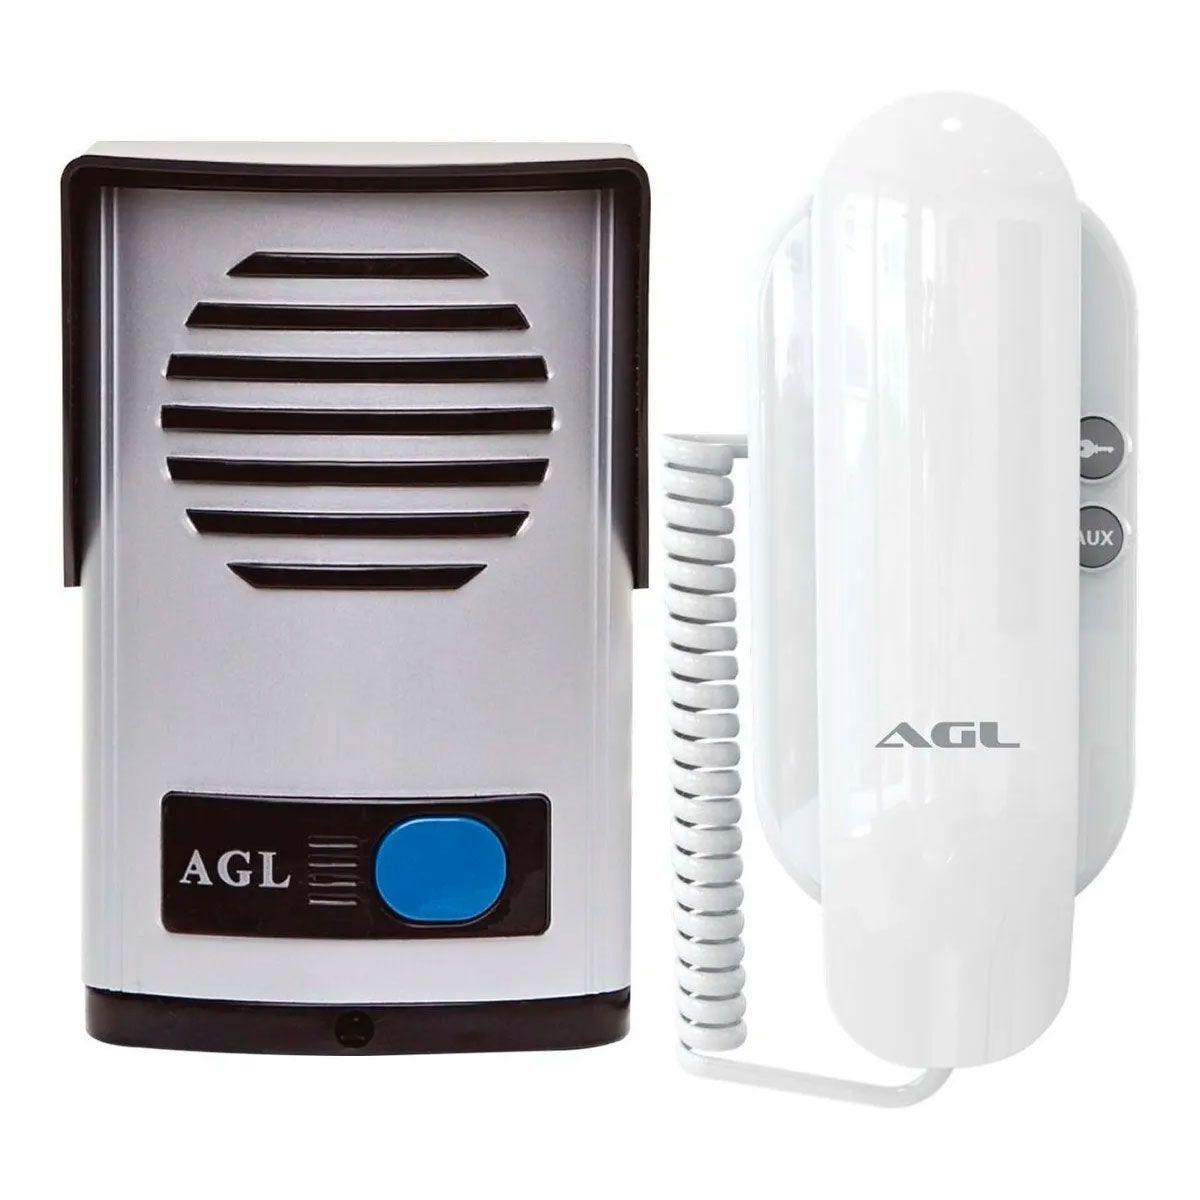 Kit Interfone Porteiro Eletrônico AGL P10-S Alimentação Externa